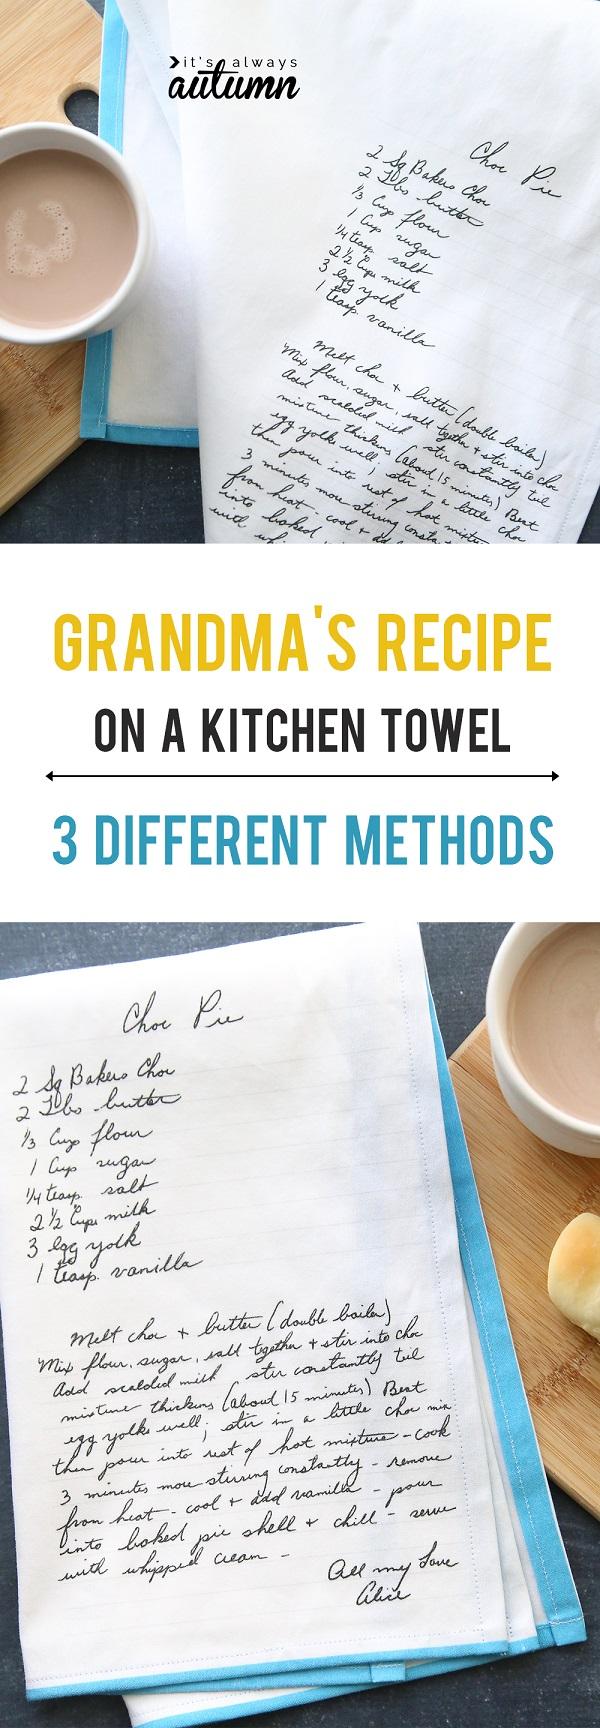 Tutorial: 3 ways to put a handwritten recipe on a tea towel